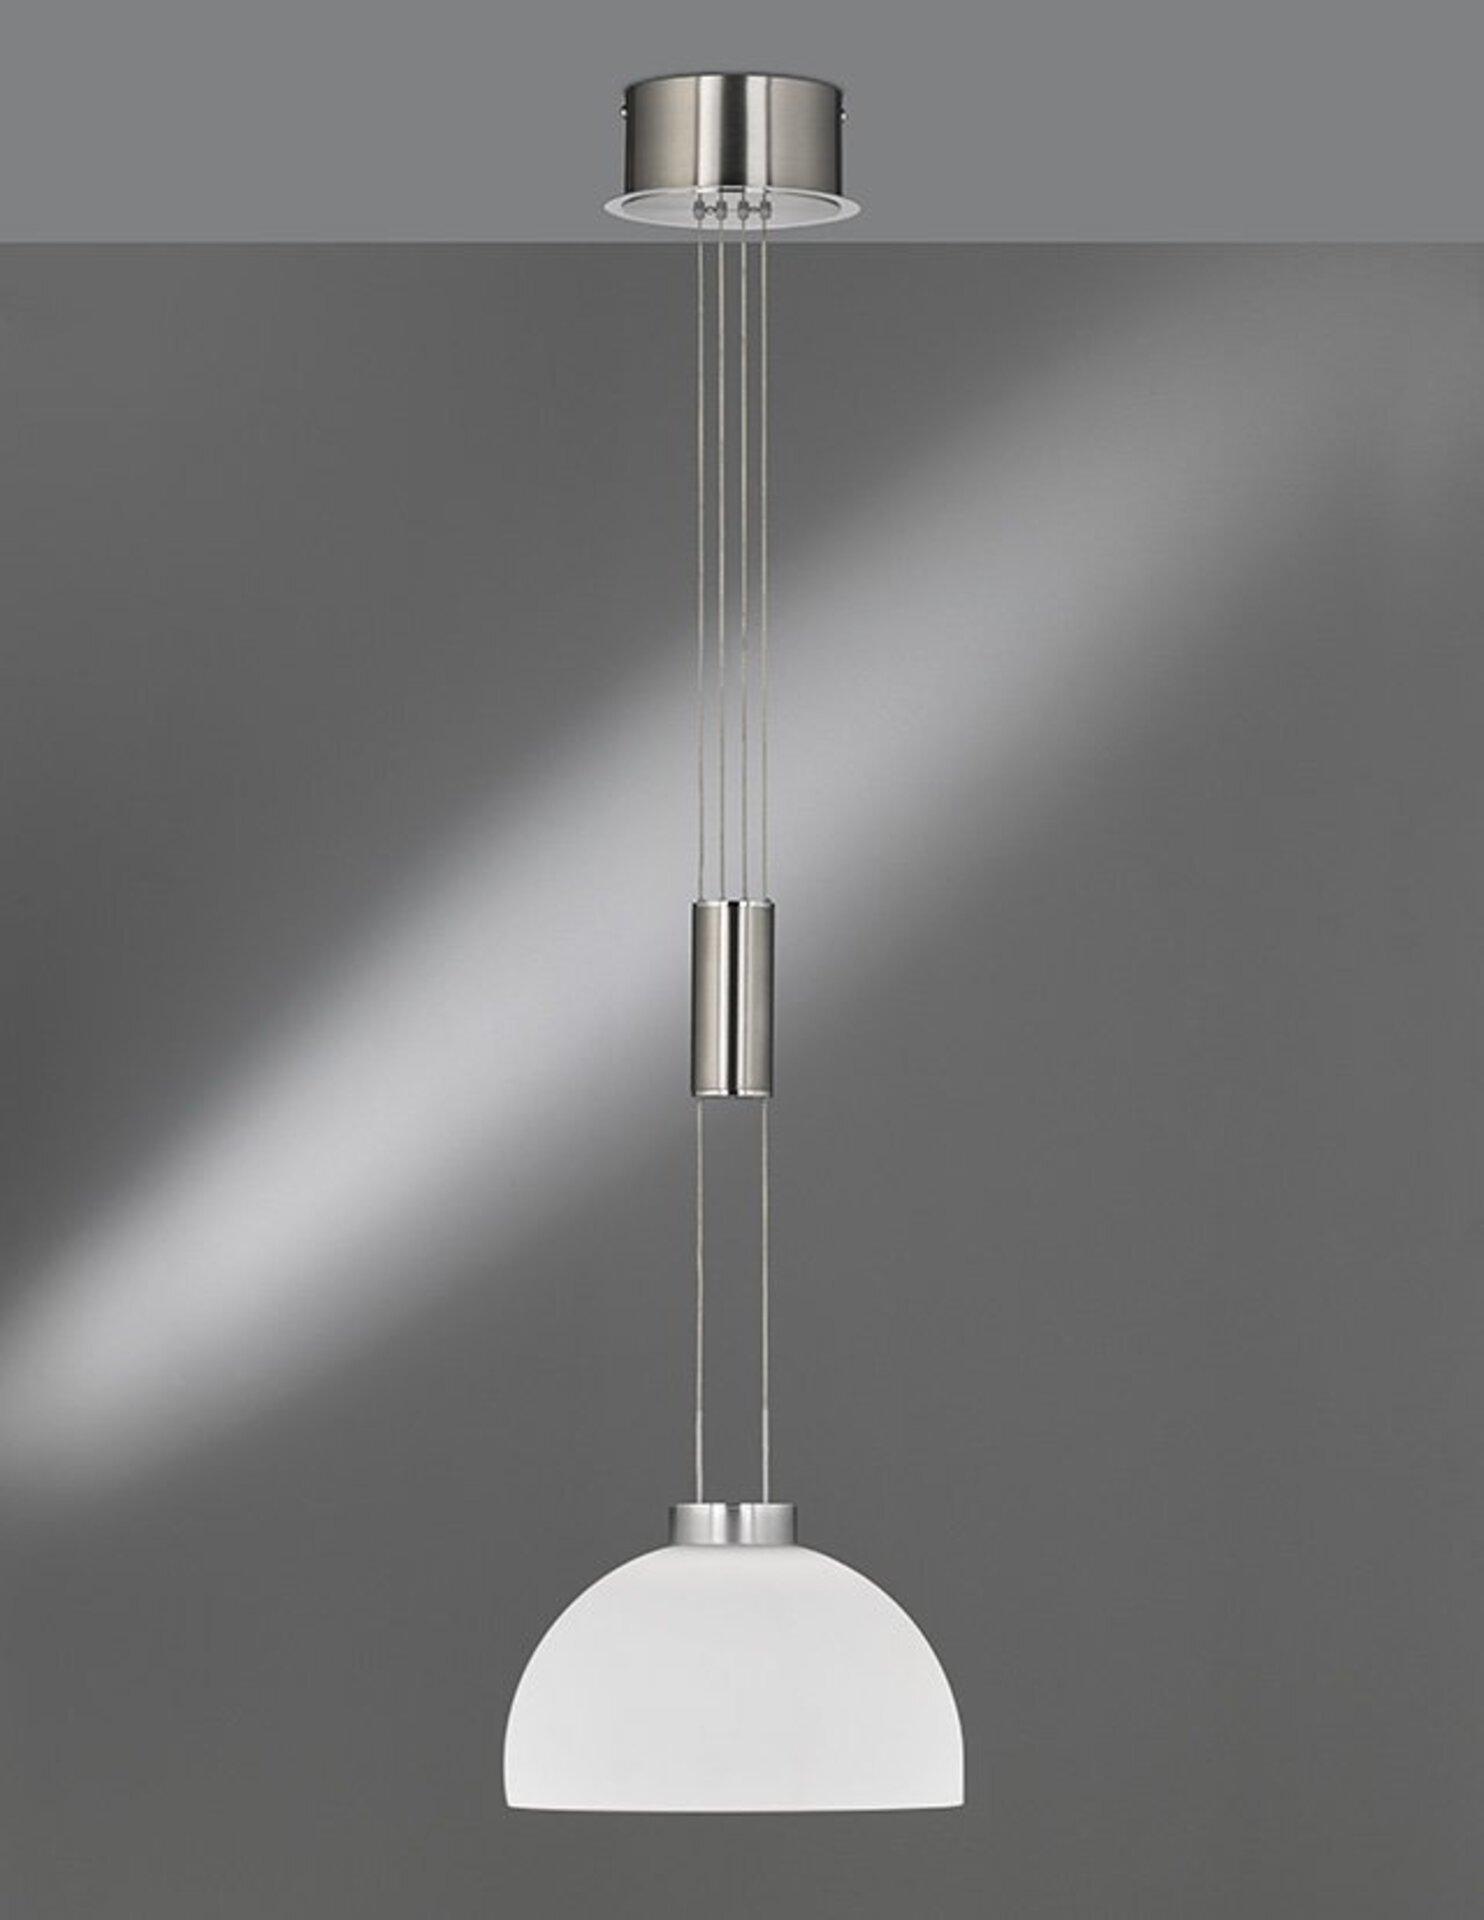 Hängeleuchte Avignon Fischer-Honsel Metall 25 x 170 x 25 cm